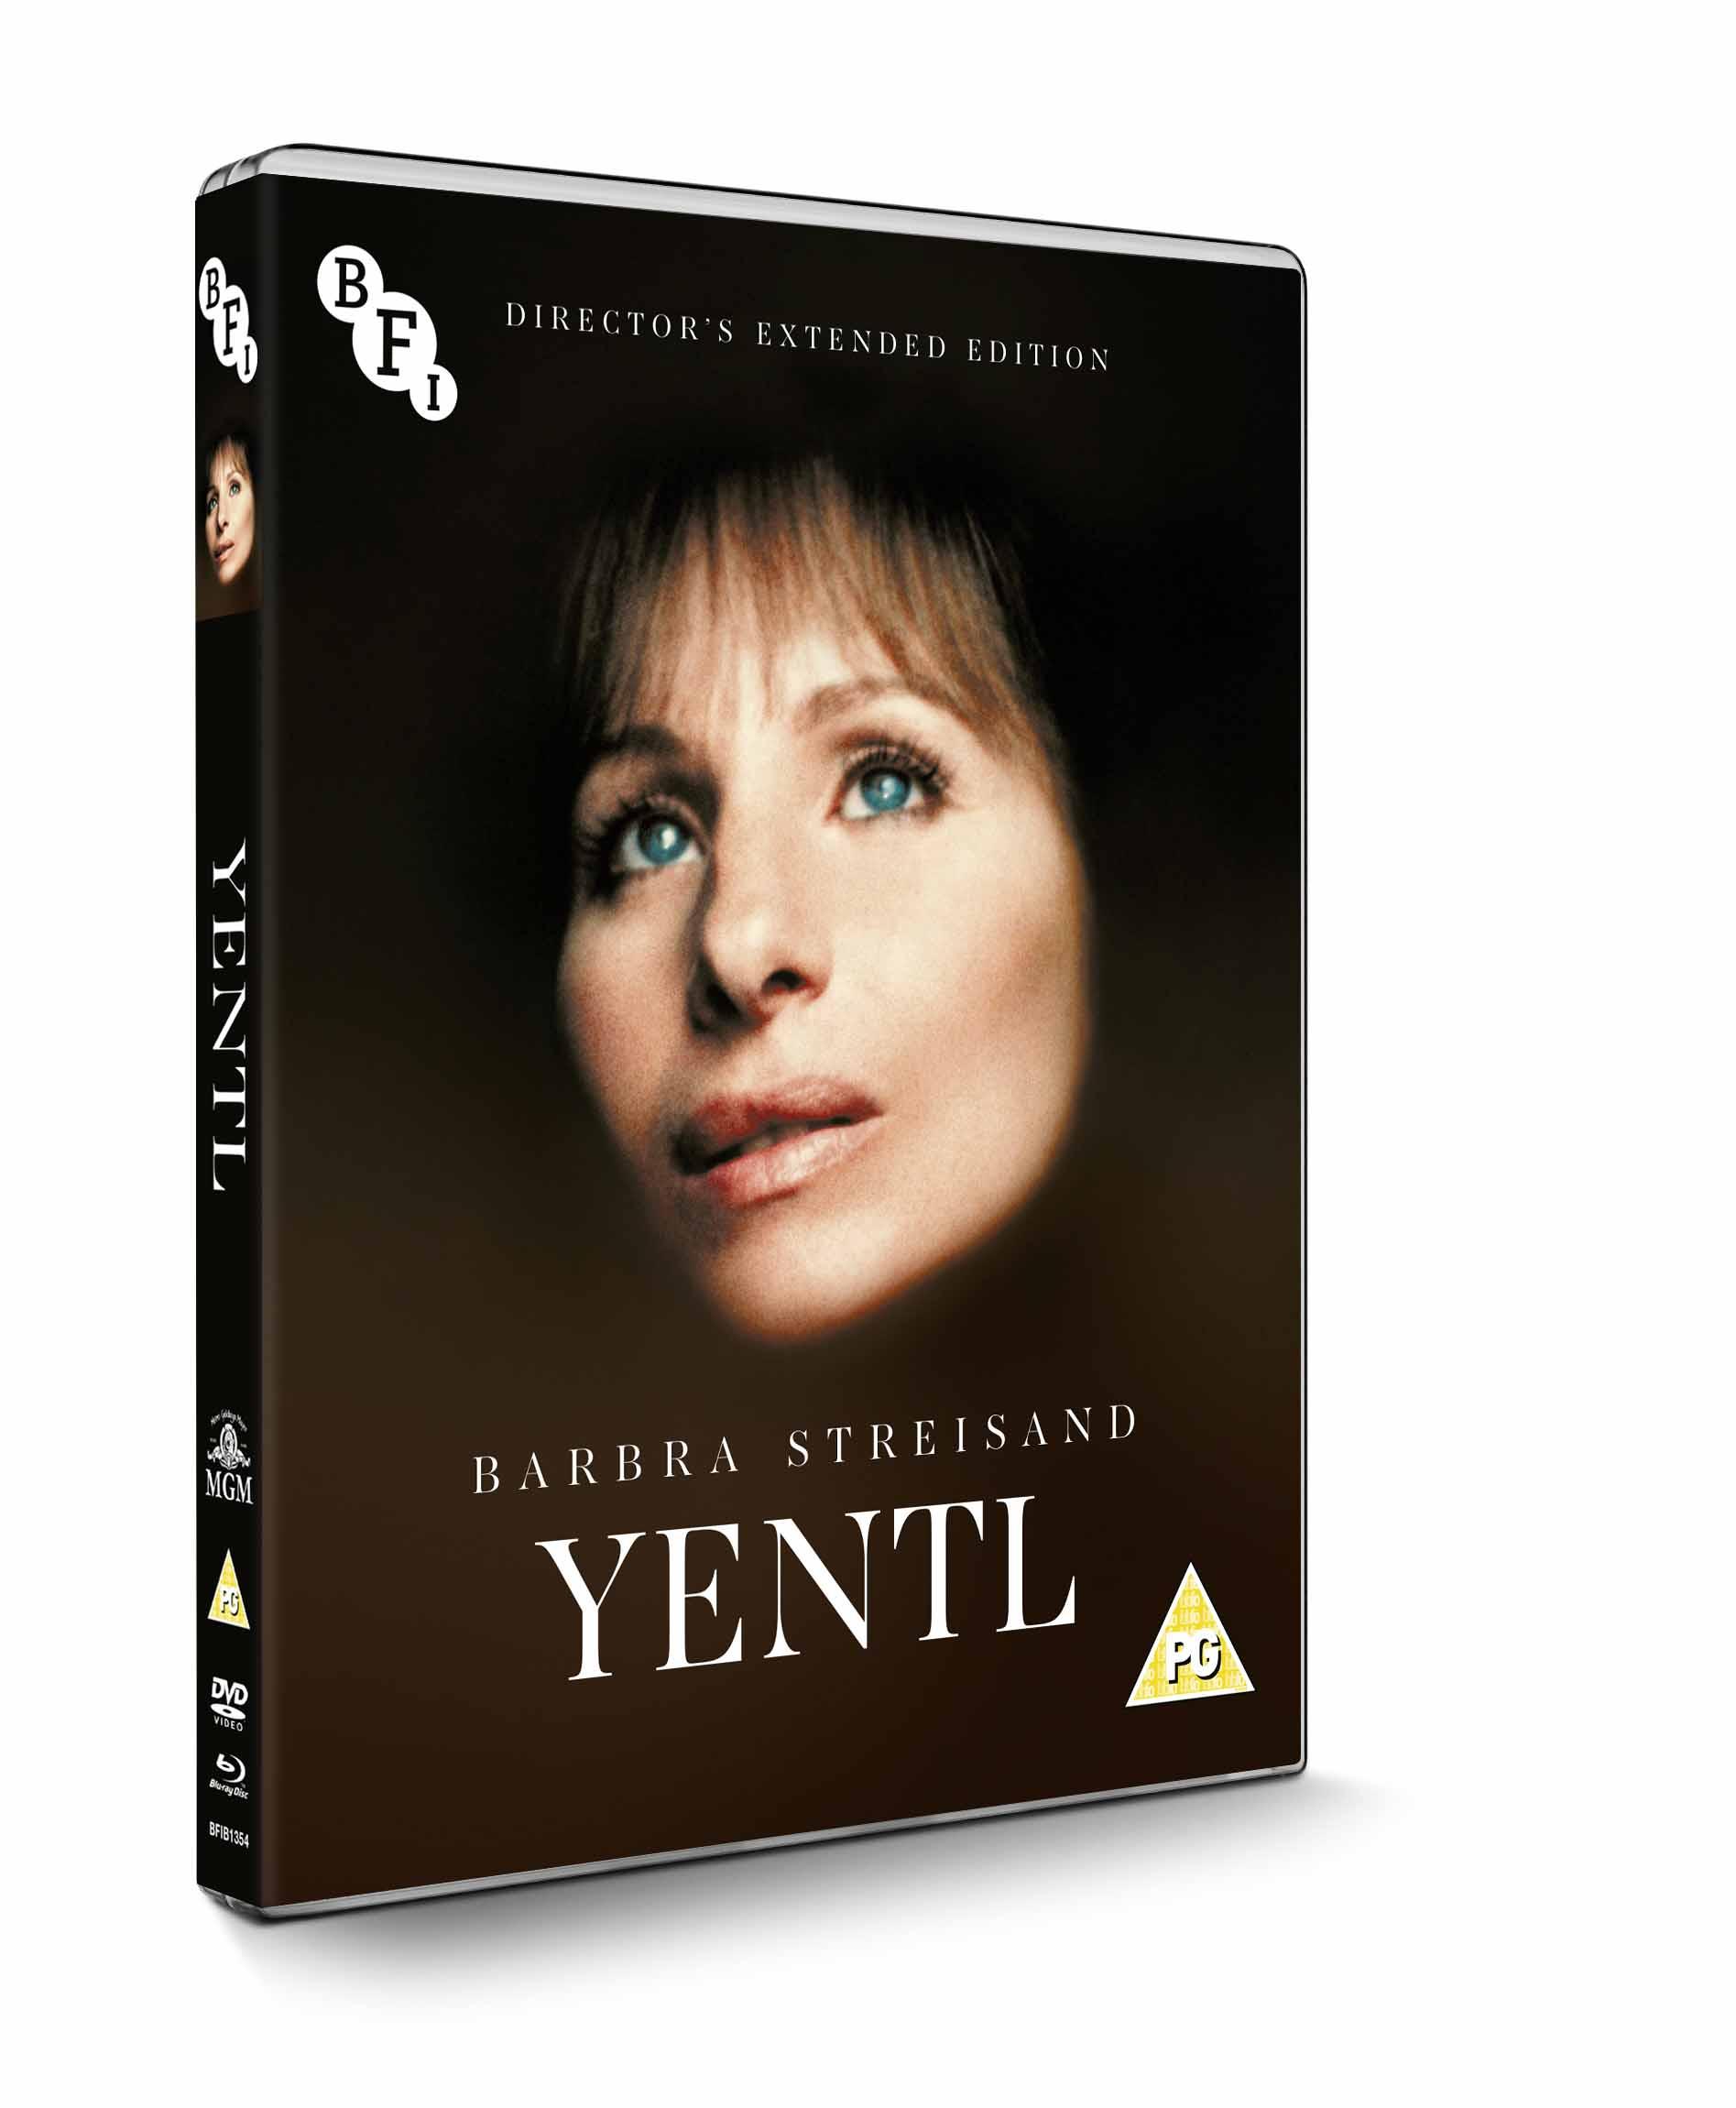 Buy Yentl (2-disc Blu-ray / DVD set)